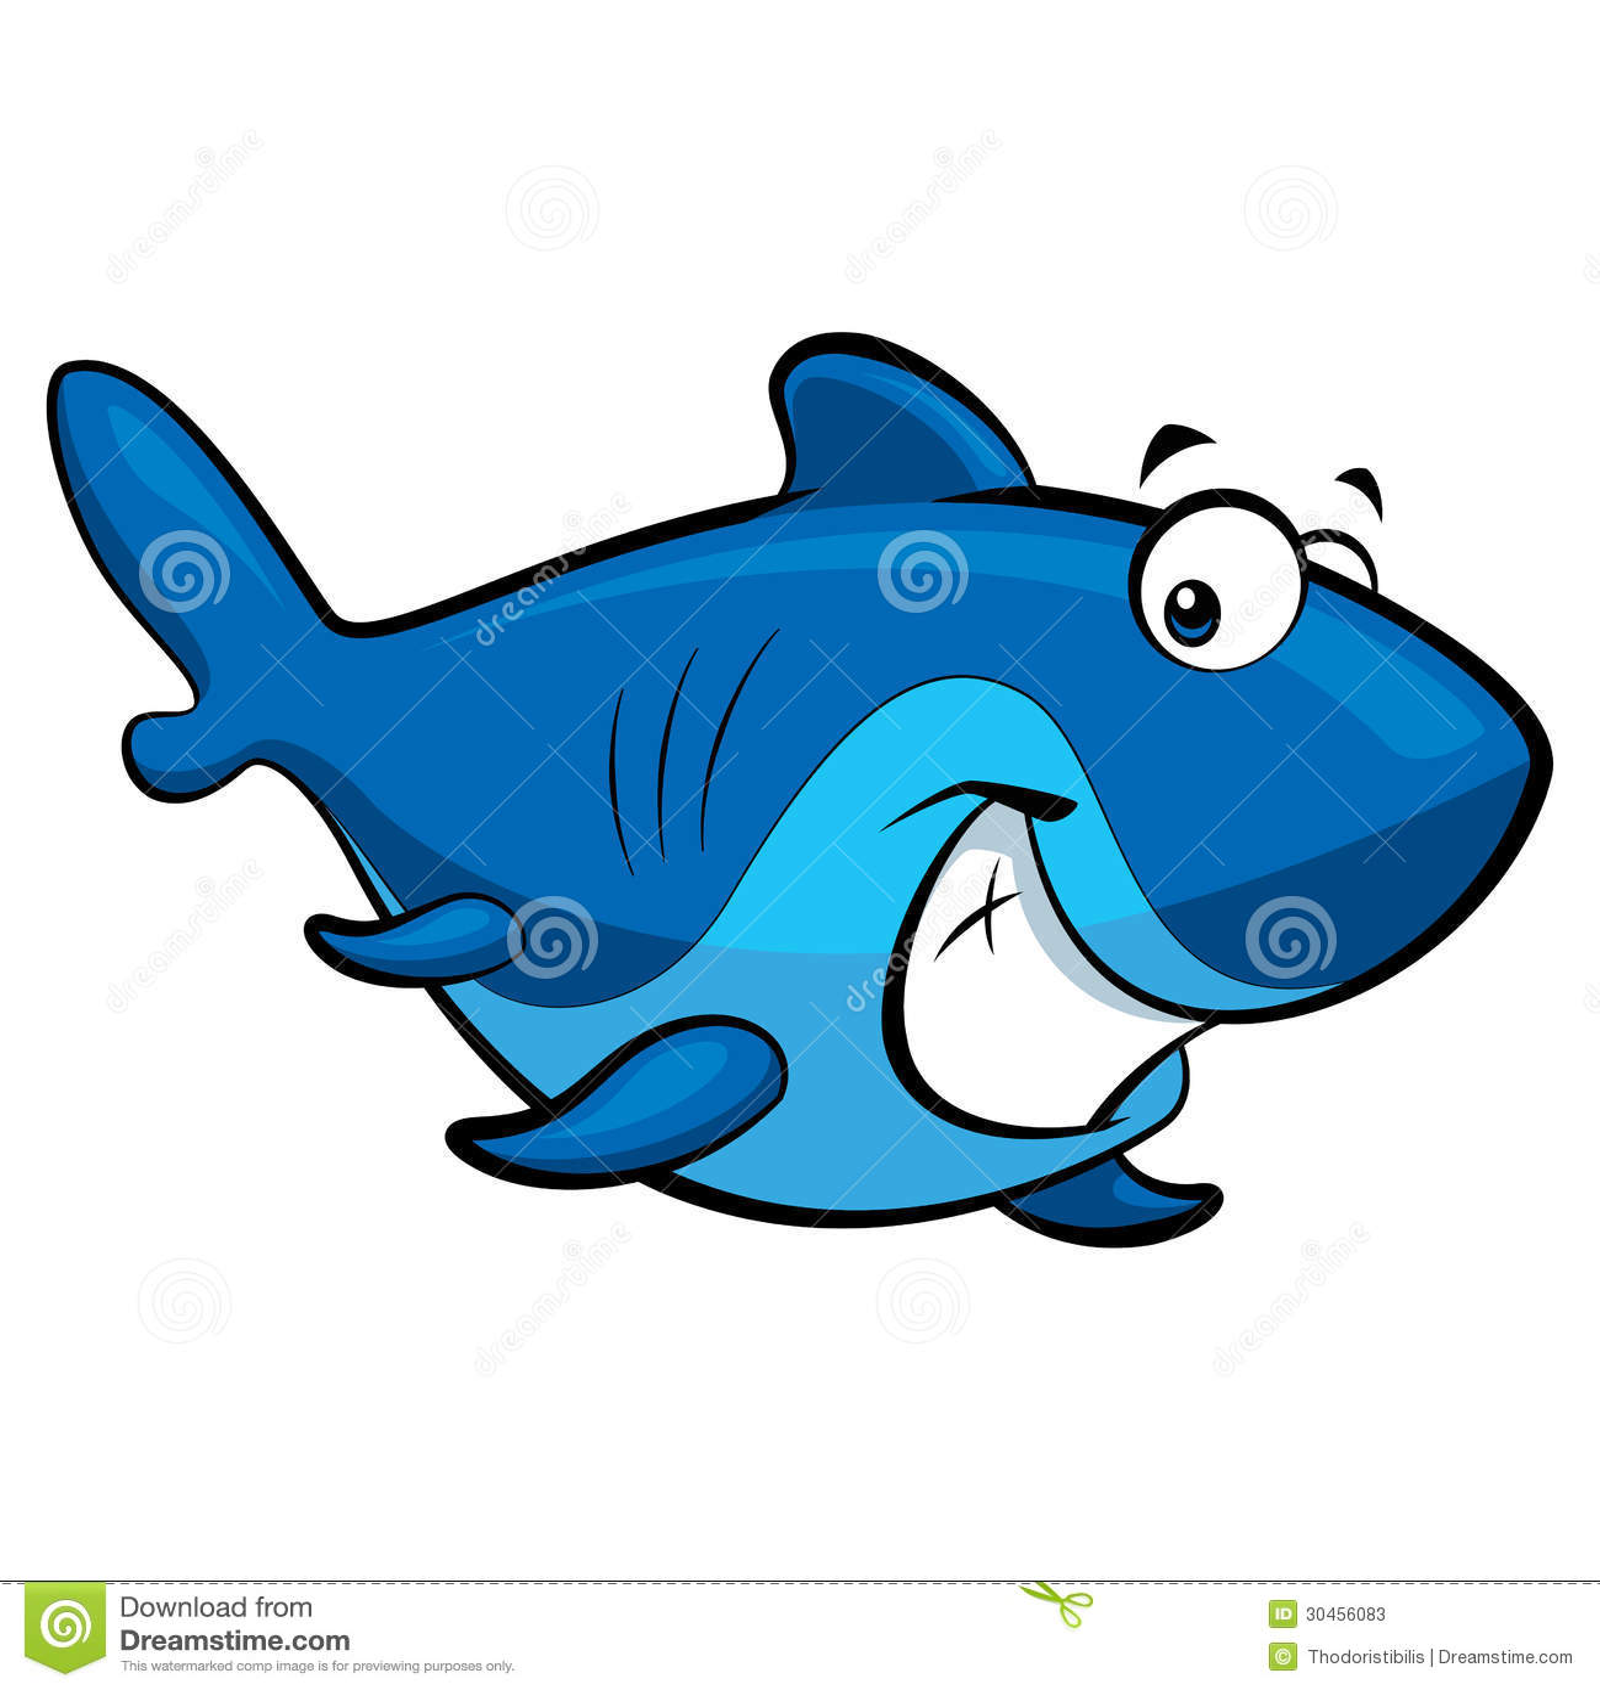 cartoon smiling shark stock illustration illustration of friendly rh dreamstime com Friendly Shark Clip Art Shark Outline Clip Art